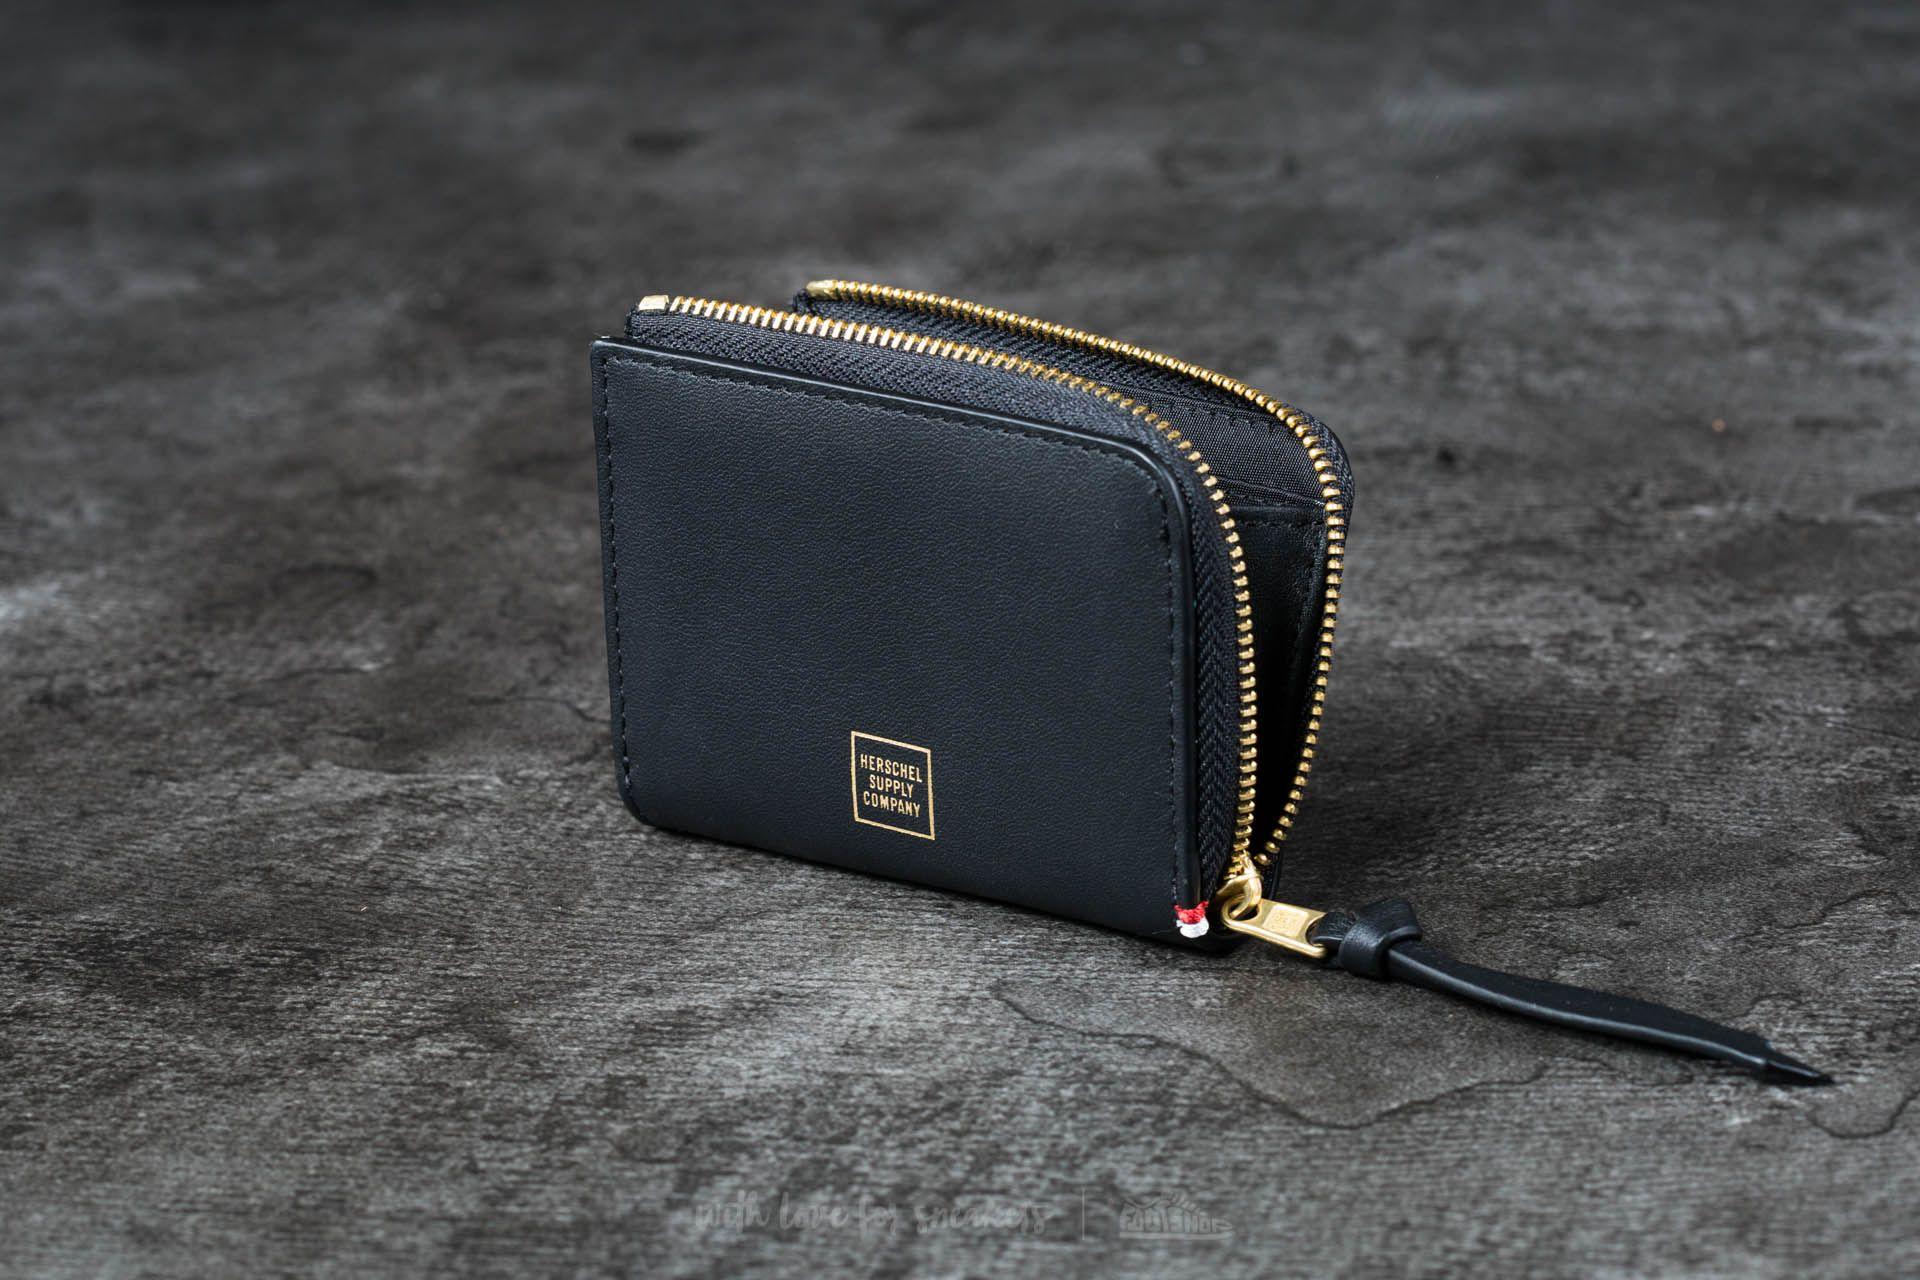 Herschel Supply Co. Lamont + Wallet Napa Black - 16559